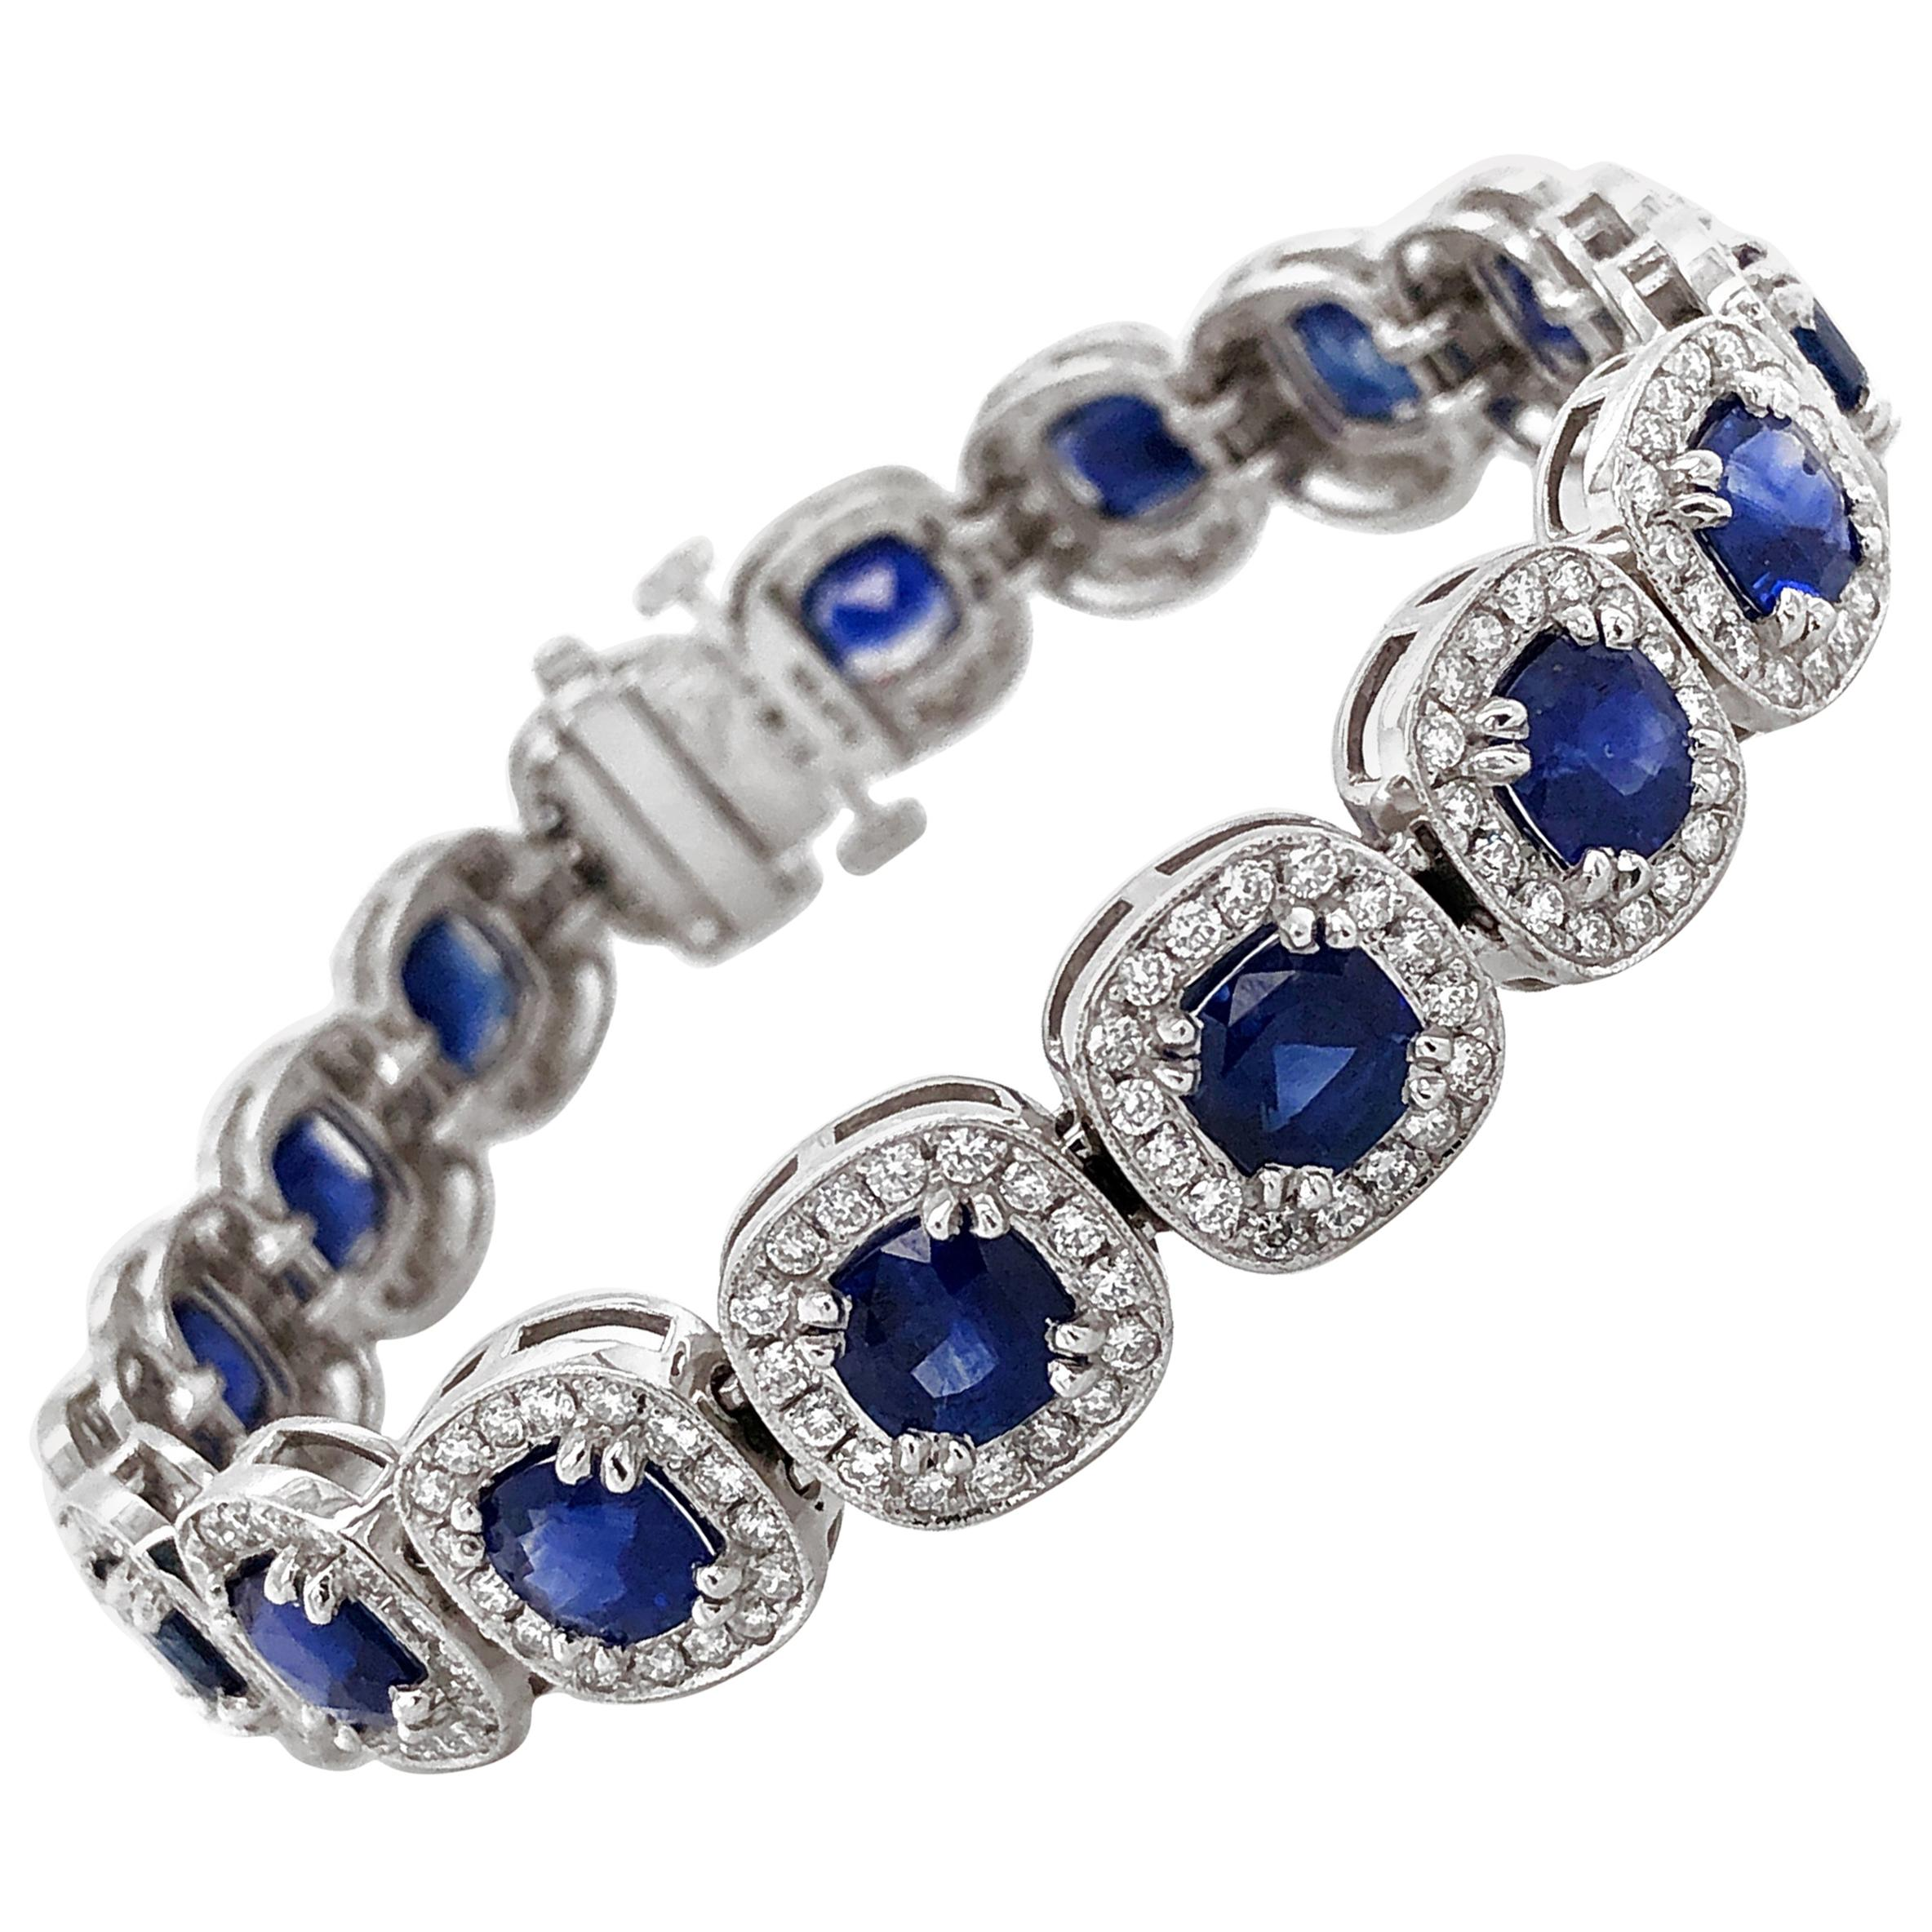 Ceylon Cushion Cut Sapphires 15.18 Carat Diamond Platinum Link Bracelet